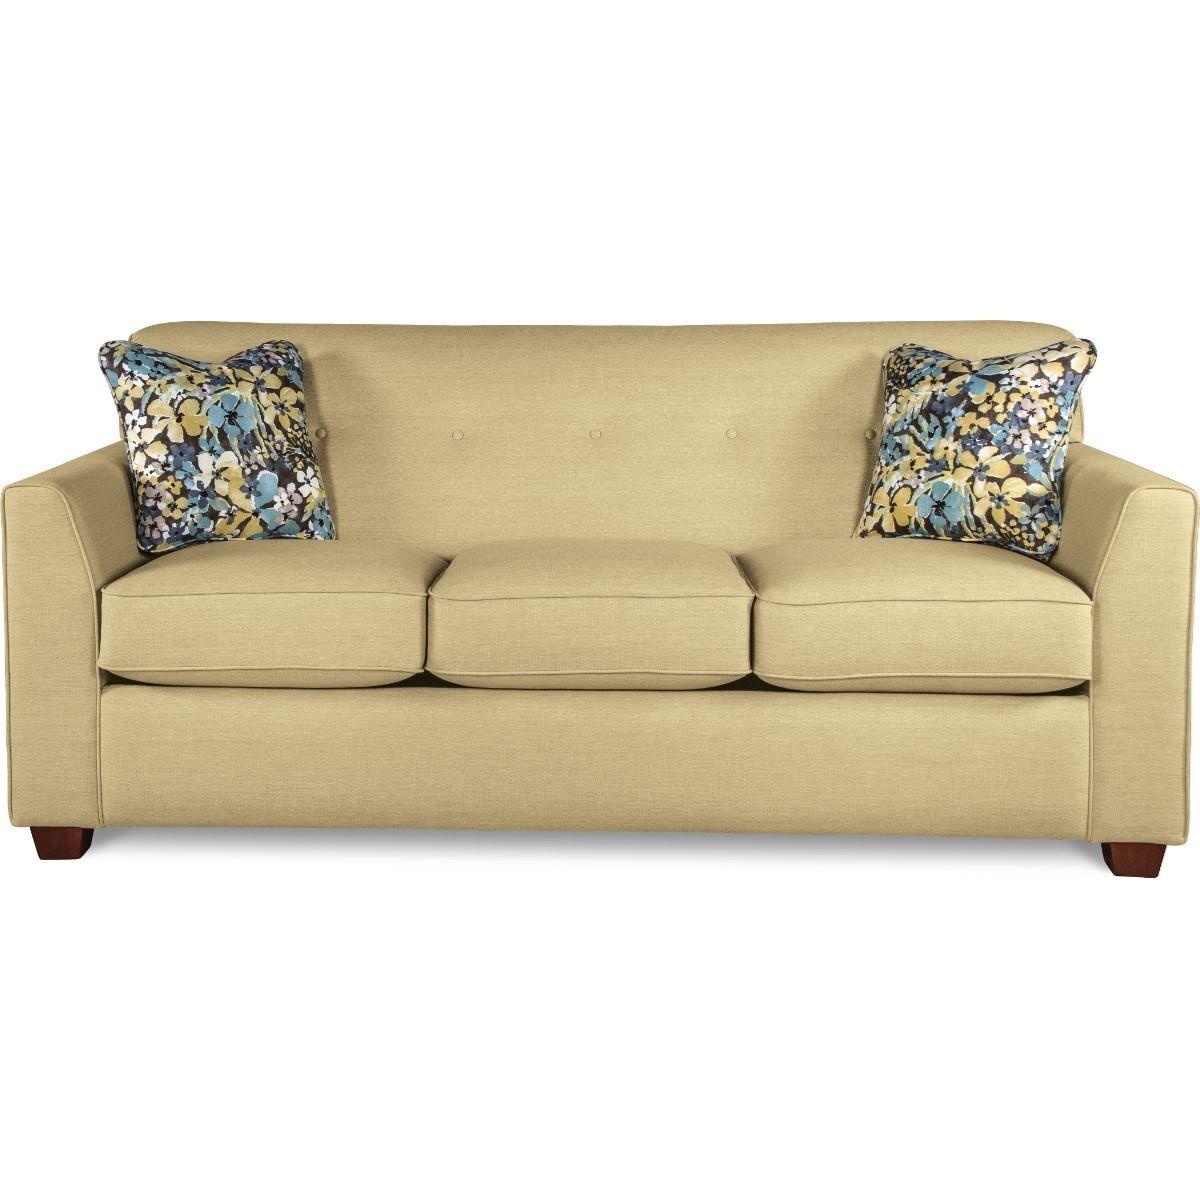 Dixie Queen Sleeper Sofa by La-Z-Boy at Jordan's Home Furnishings